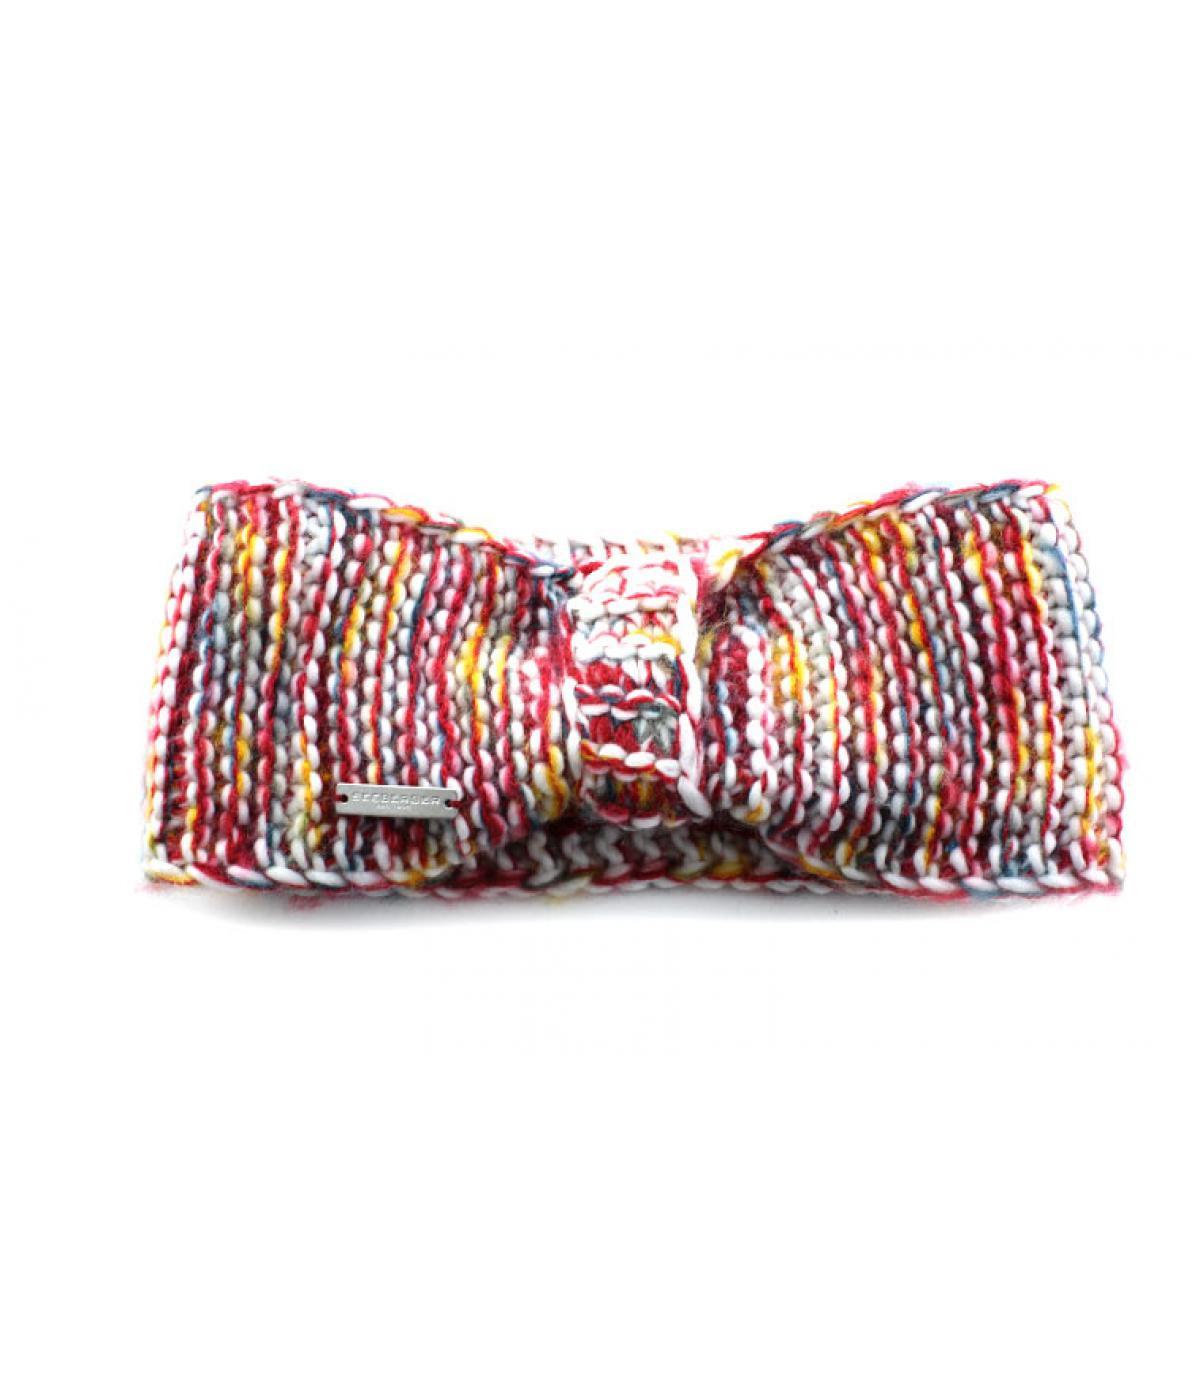 Seeberger headband